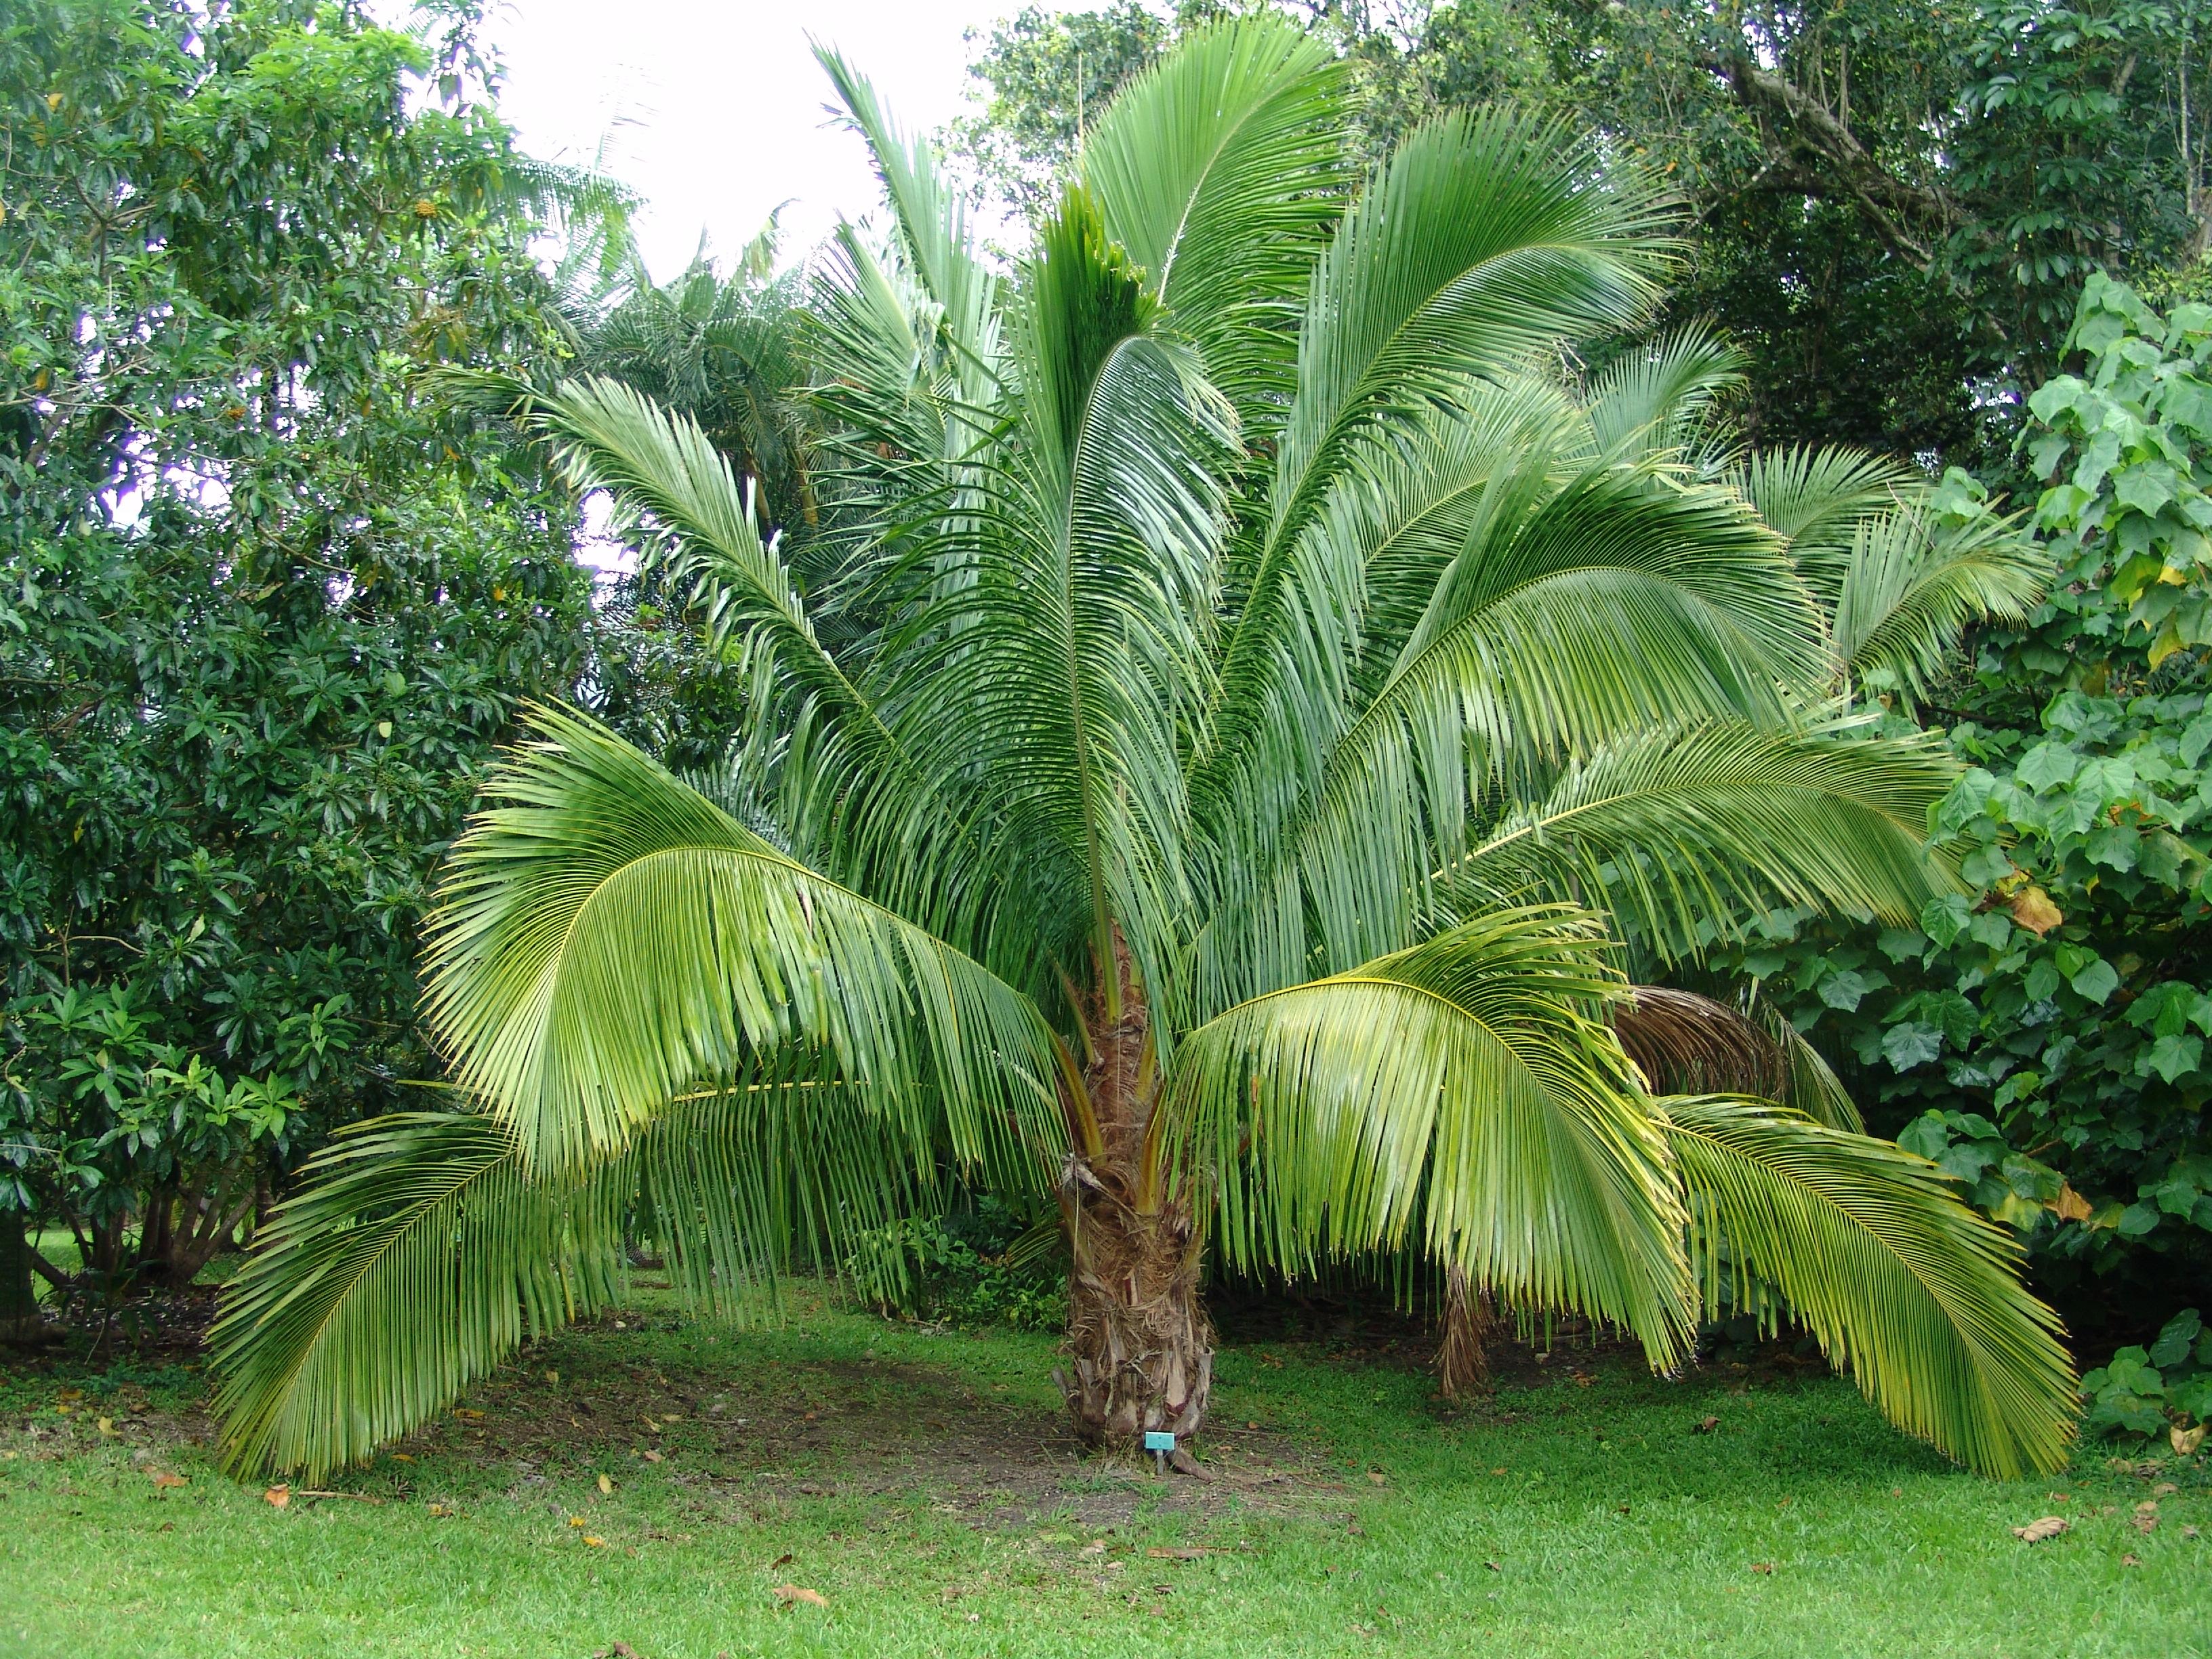 Wiki arecaceae upcscavenger - Real areca palm ...